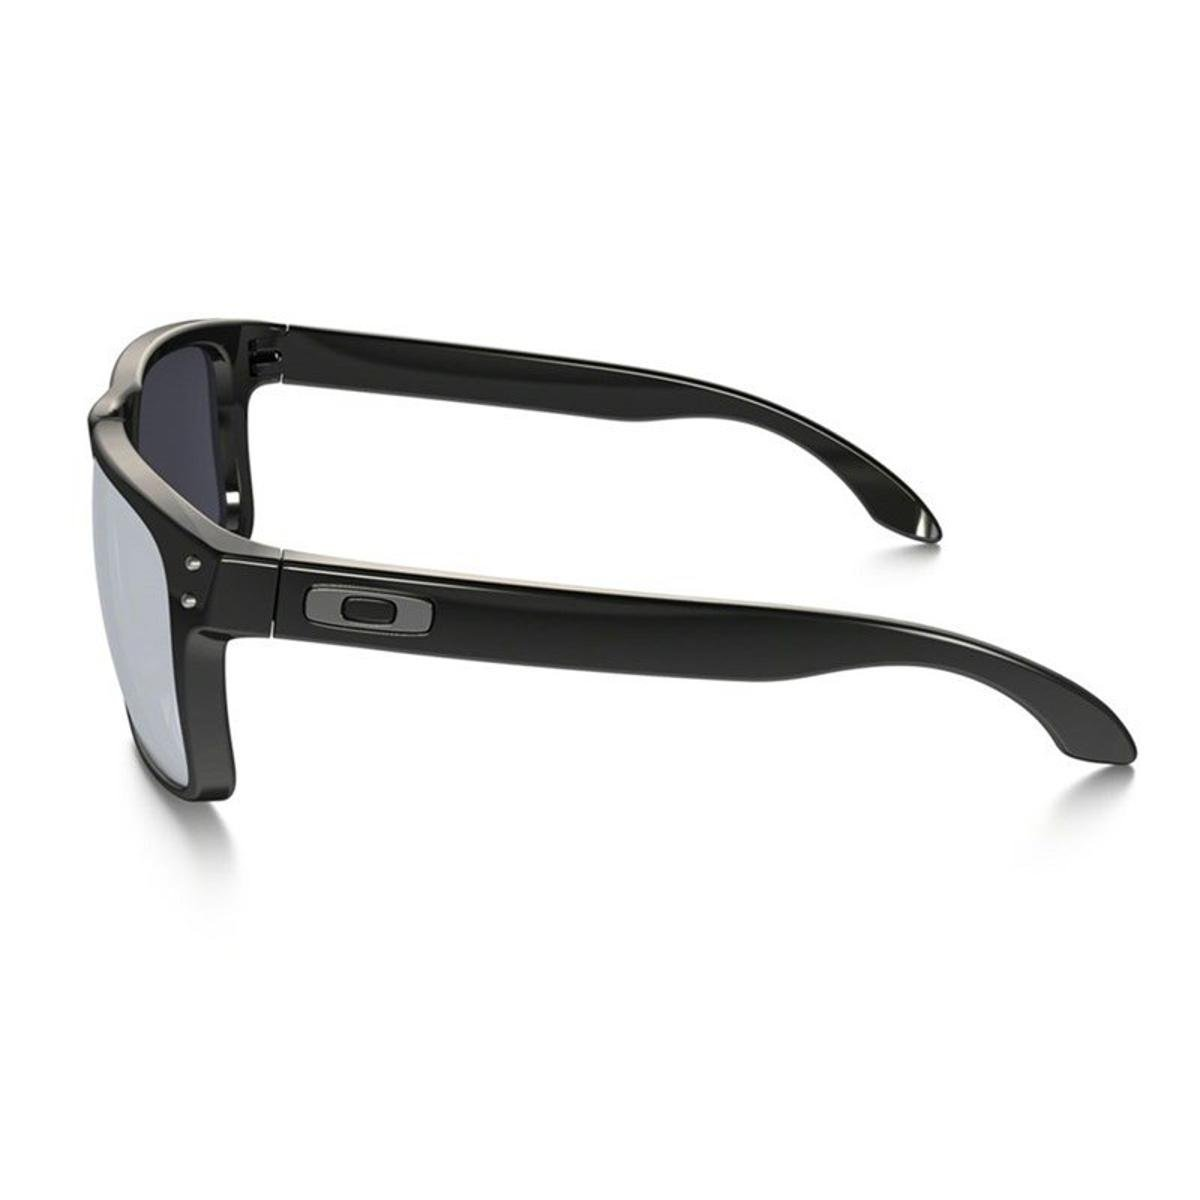 Óculos de Sol Oakley Holbrook Polished - Preto - Compre Agora   Zattini 47a9c88678